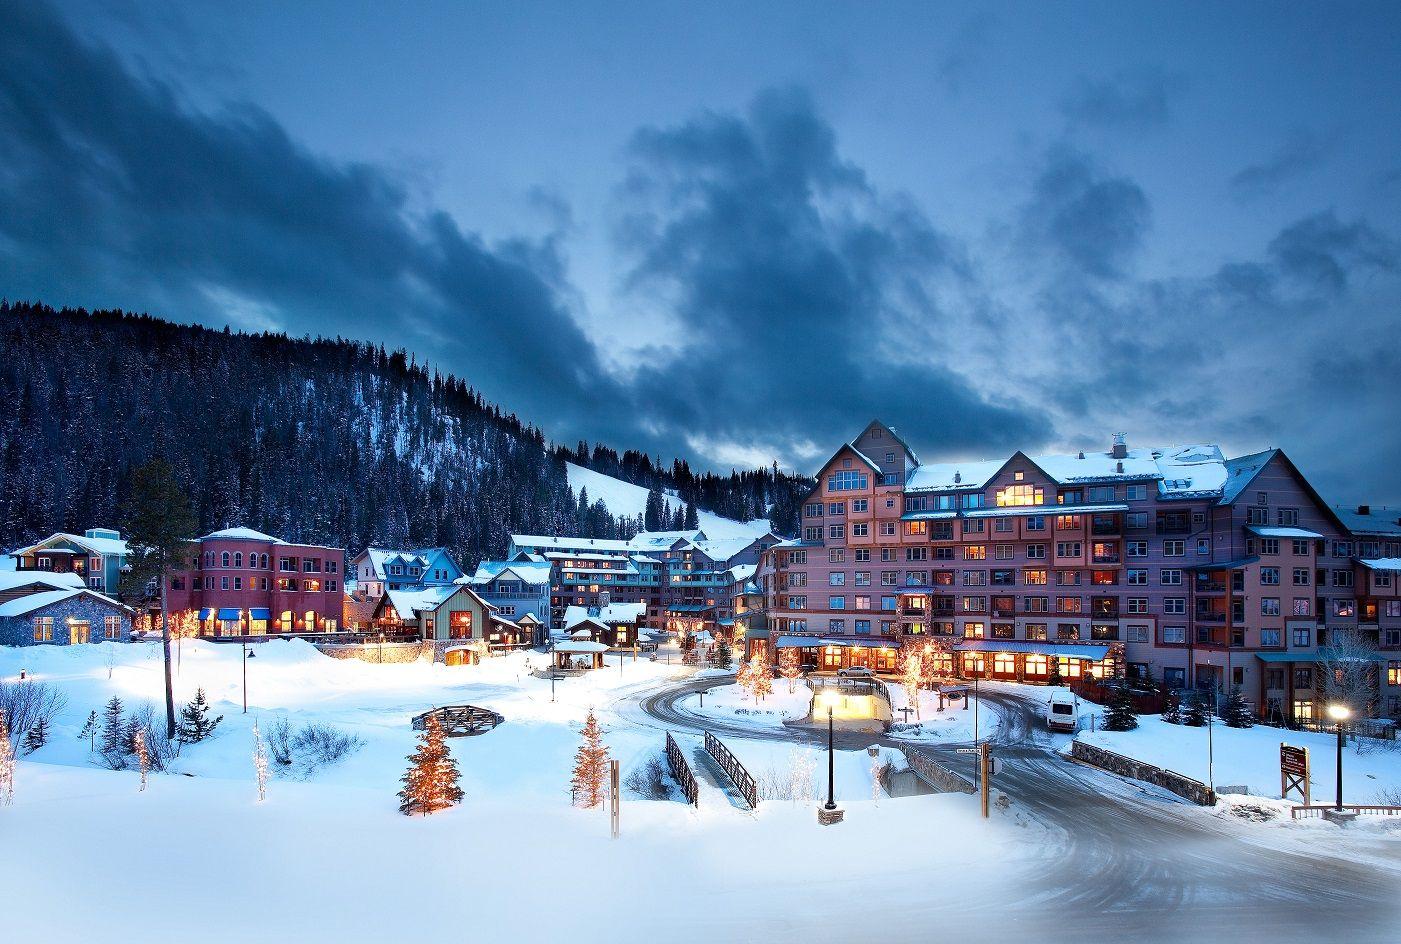 Destinos de Estados Unidos para Esquiar - Aspen Colorado